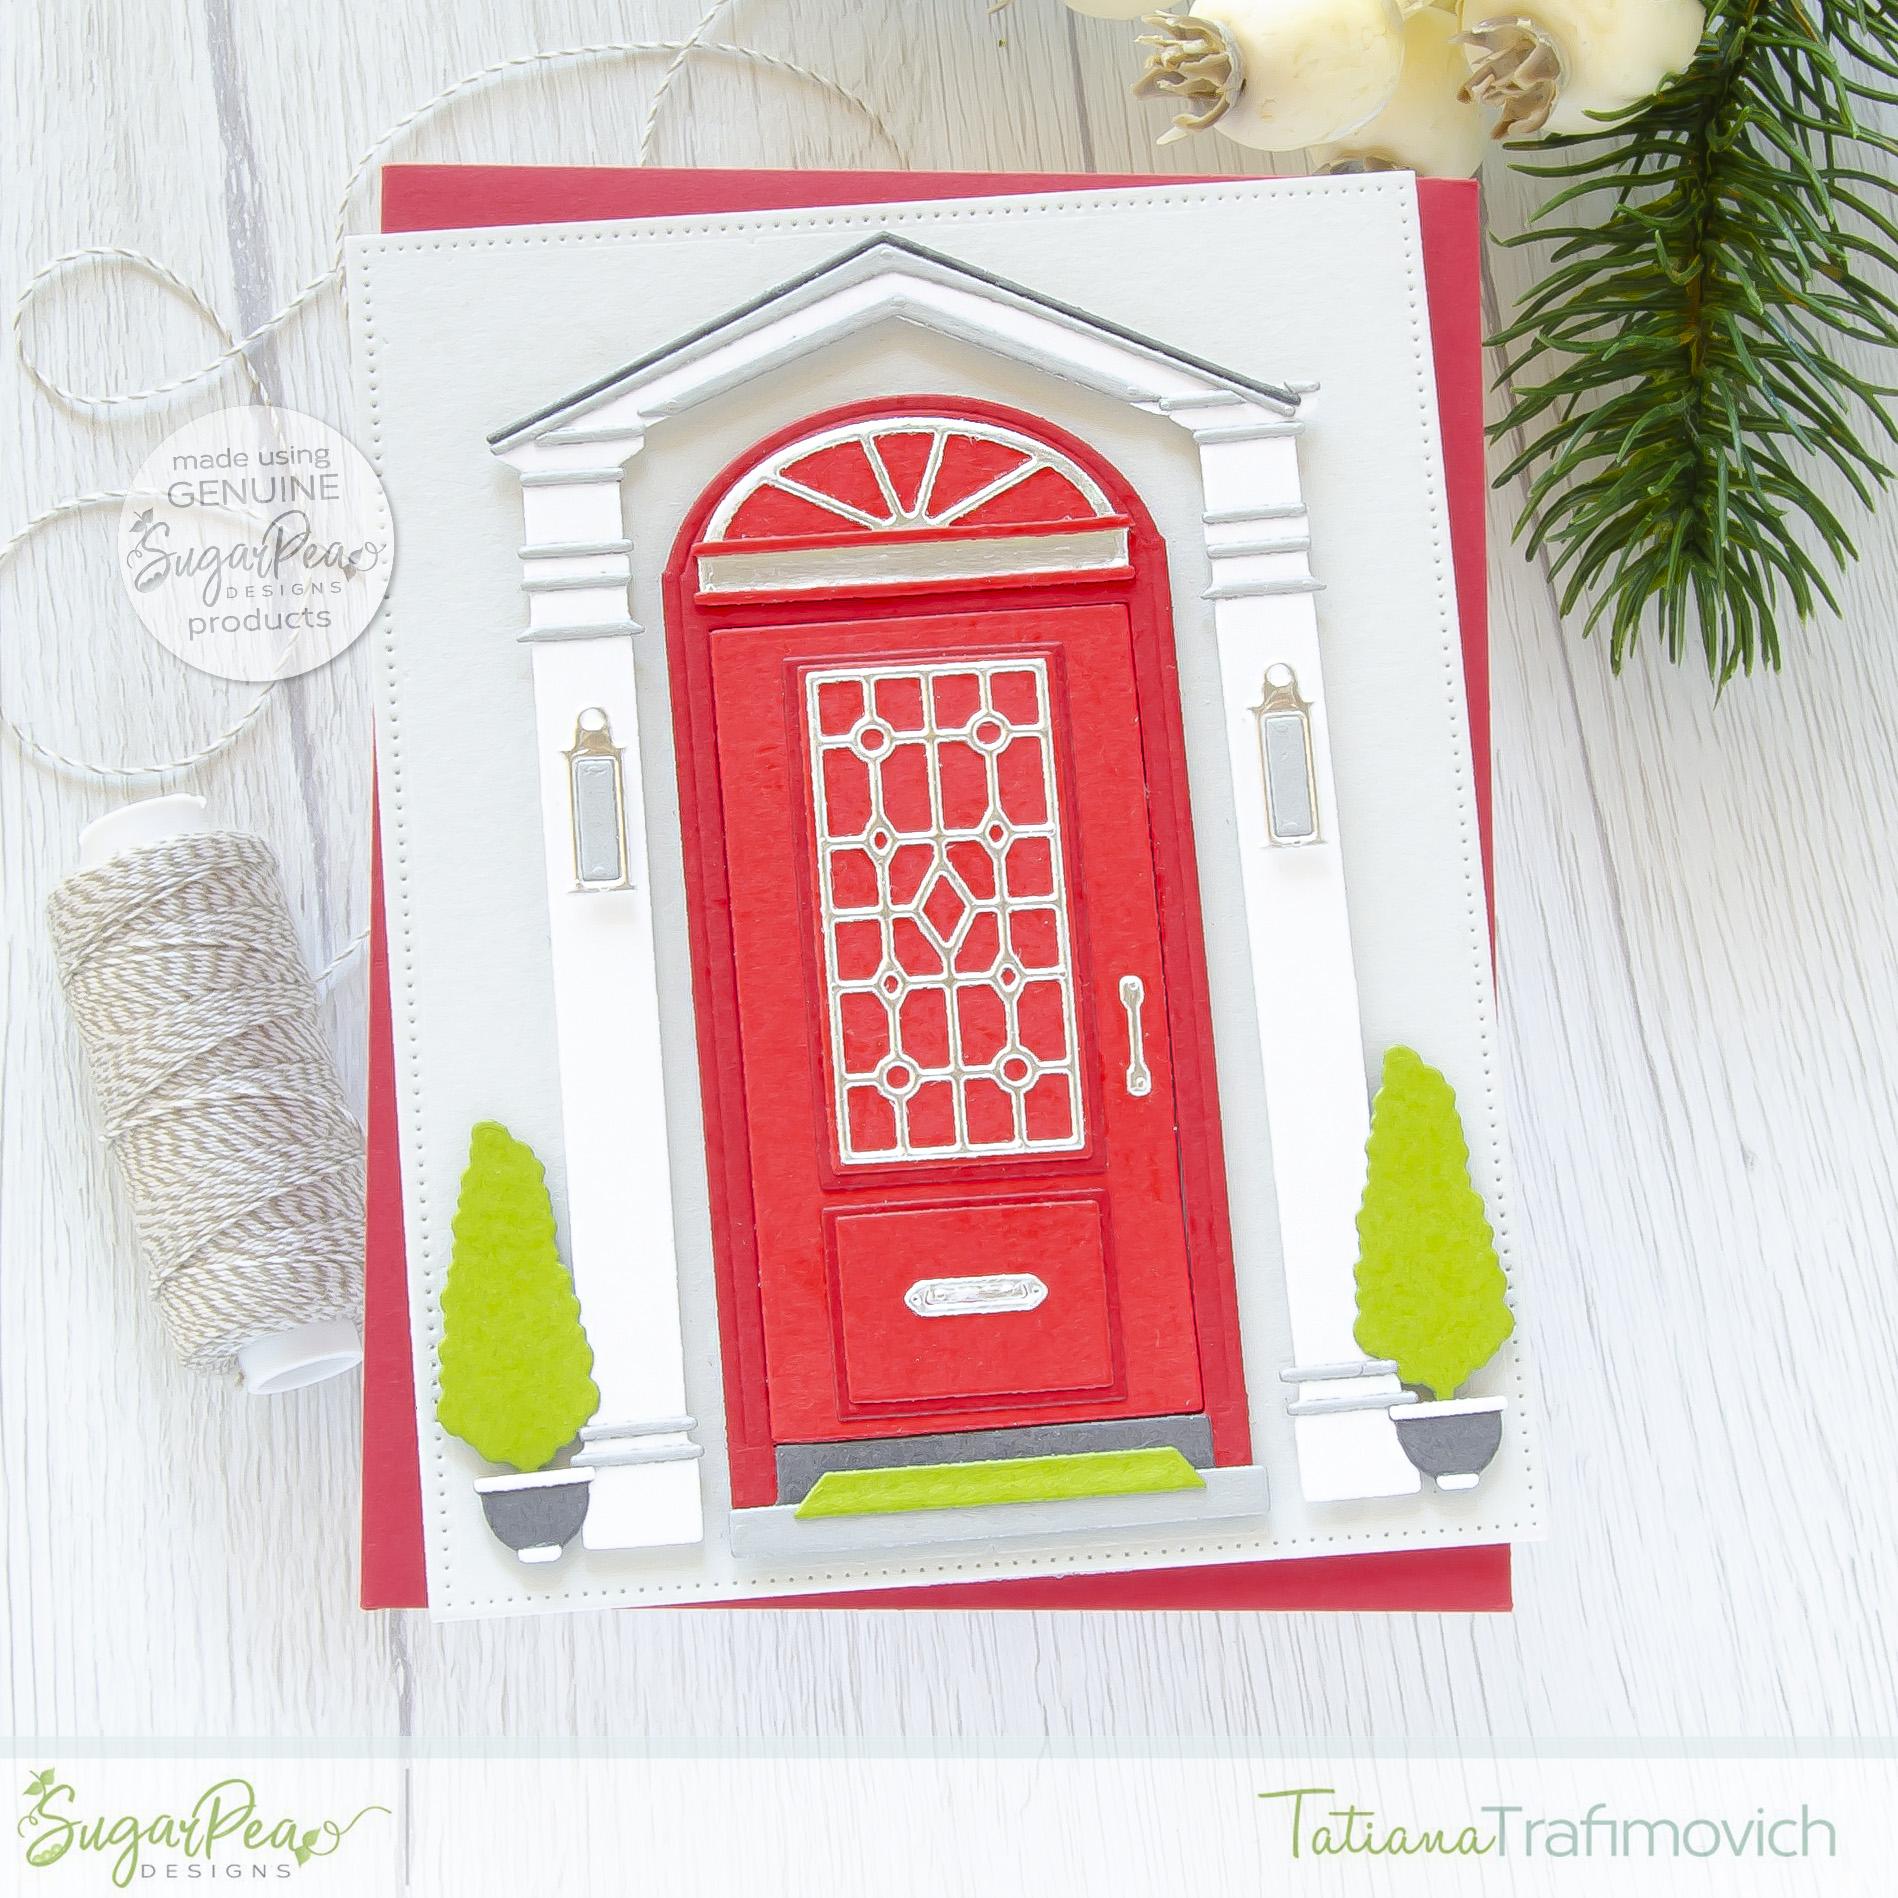 Shut The Front Door #handmade card by Tatiana Trafimovich #tatianacraftandart - Shut The Front Door SugarCut by SugarPea Designs #sugarpeadesigns